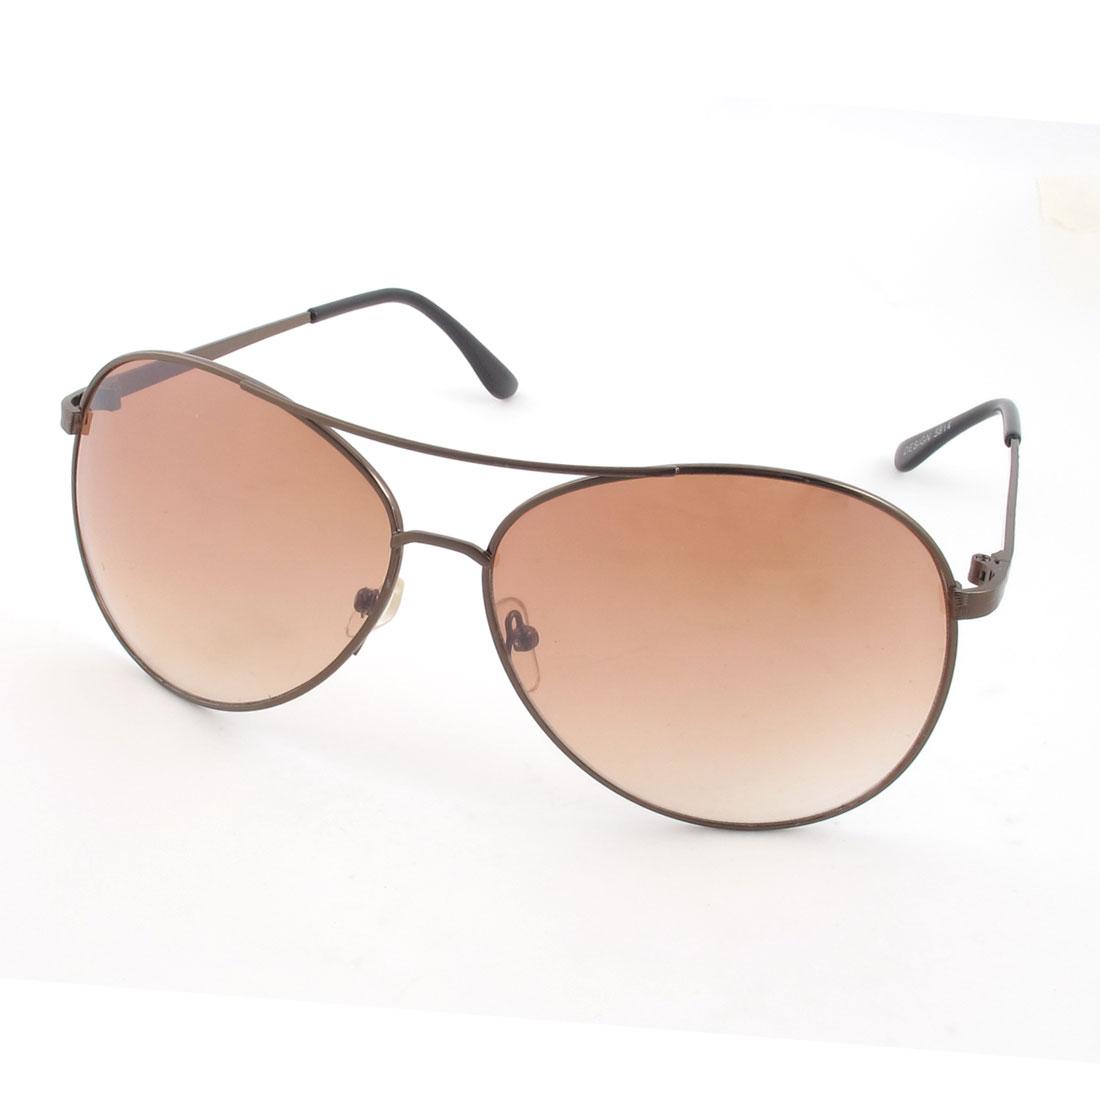 Men Metal Aviator Sunglasses UV400 Protection Outdoor Eyewear